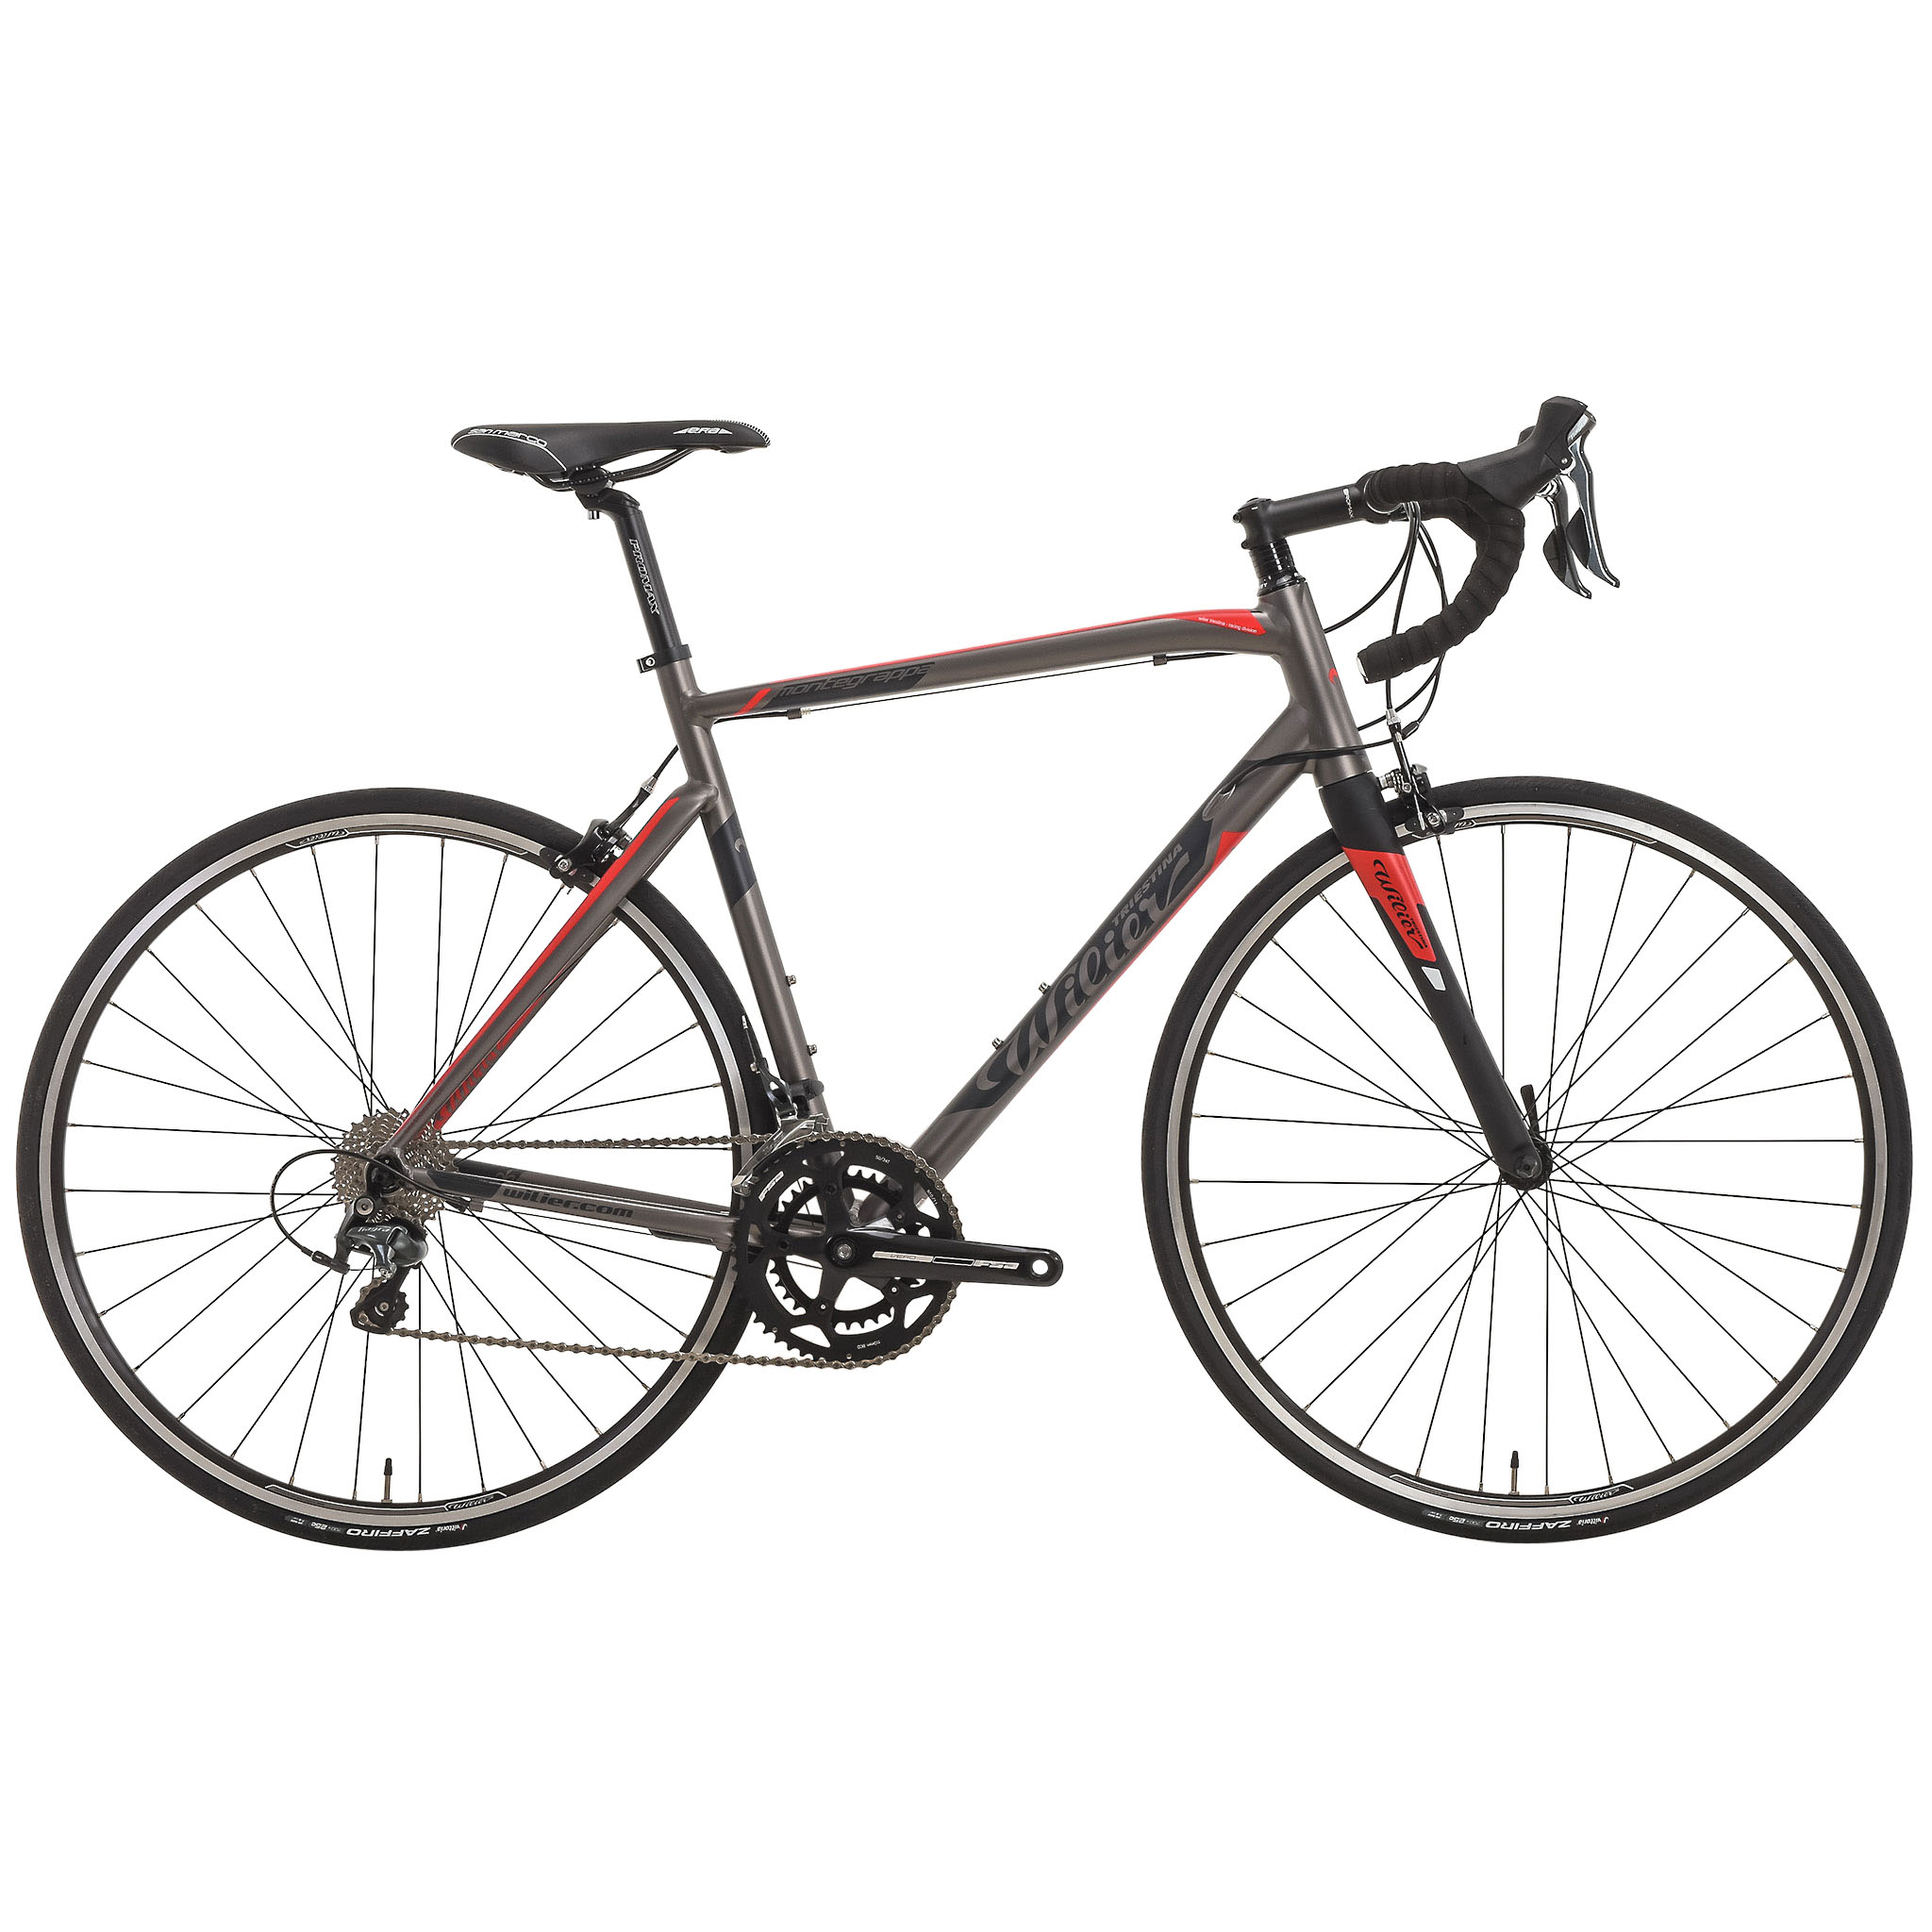 Bicicleta de carrera WILIER TRIESTINA MONTEGRAPPA Shimano Tiagra 4700 34/50 Gris 2017